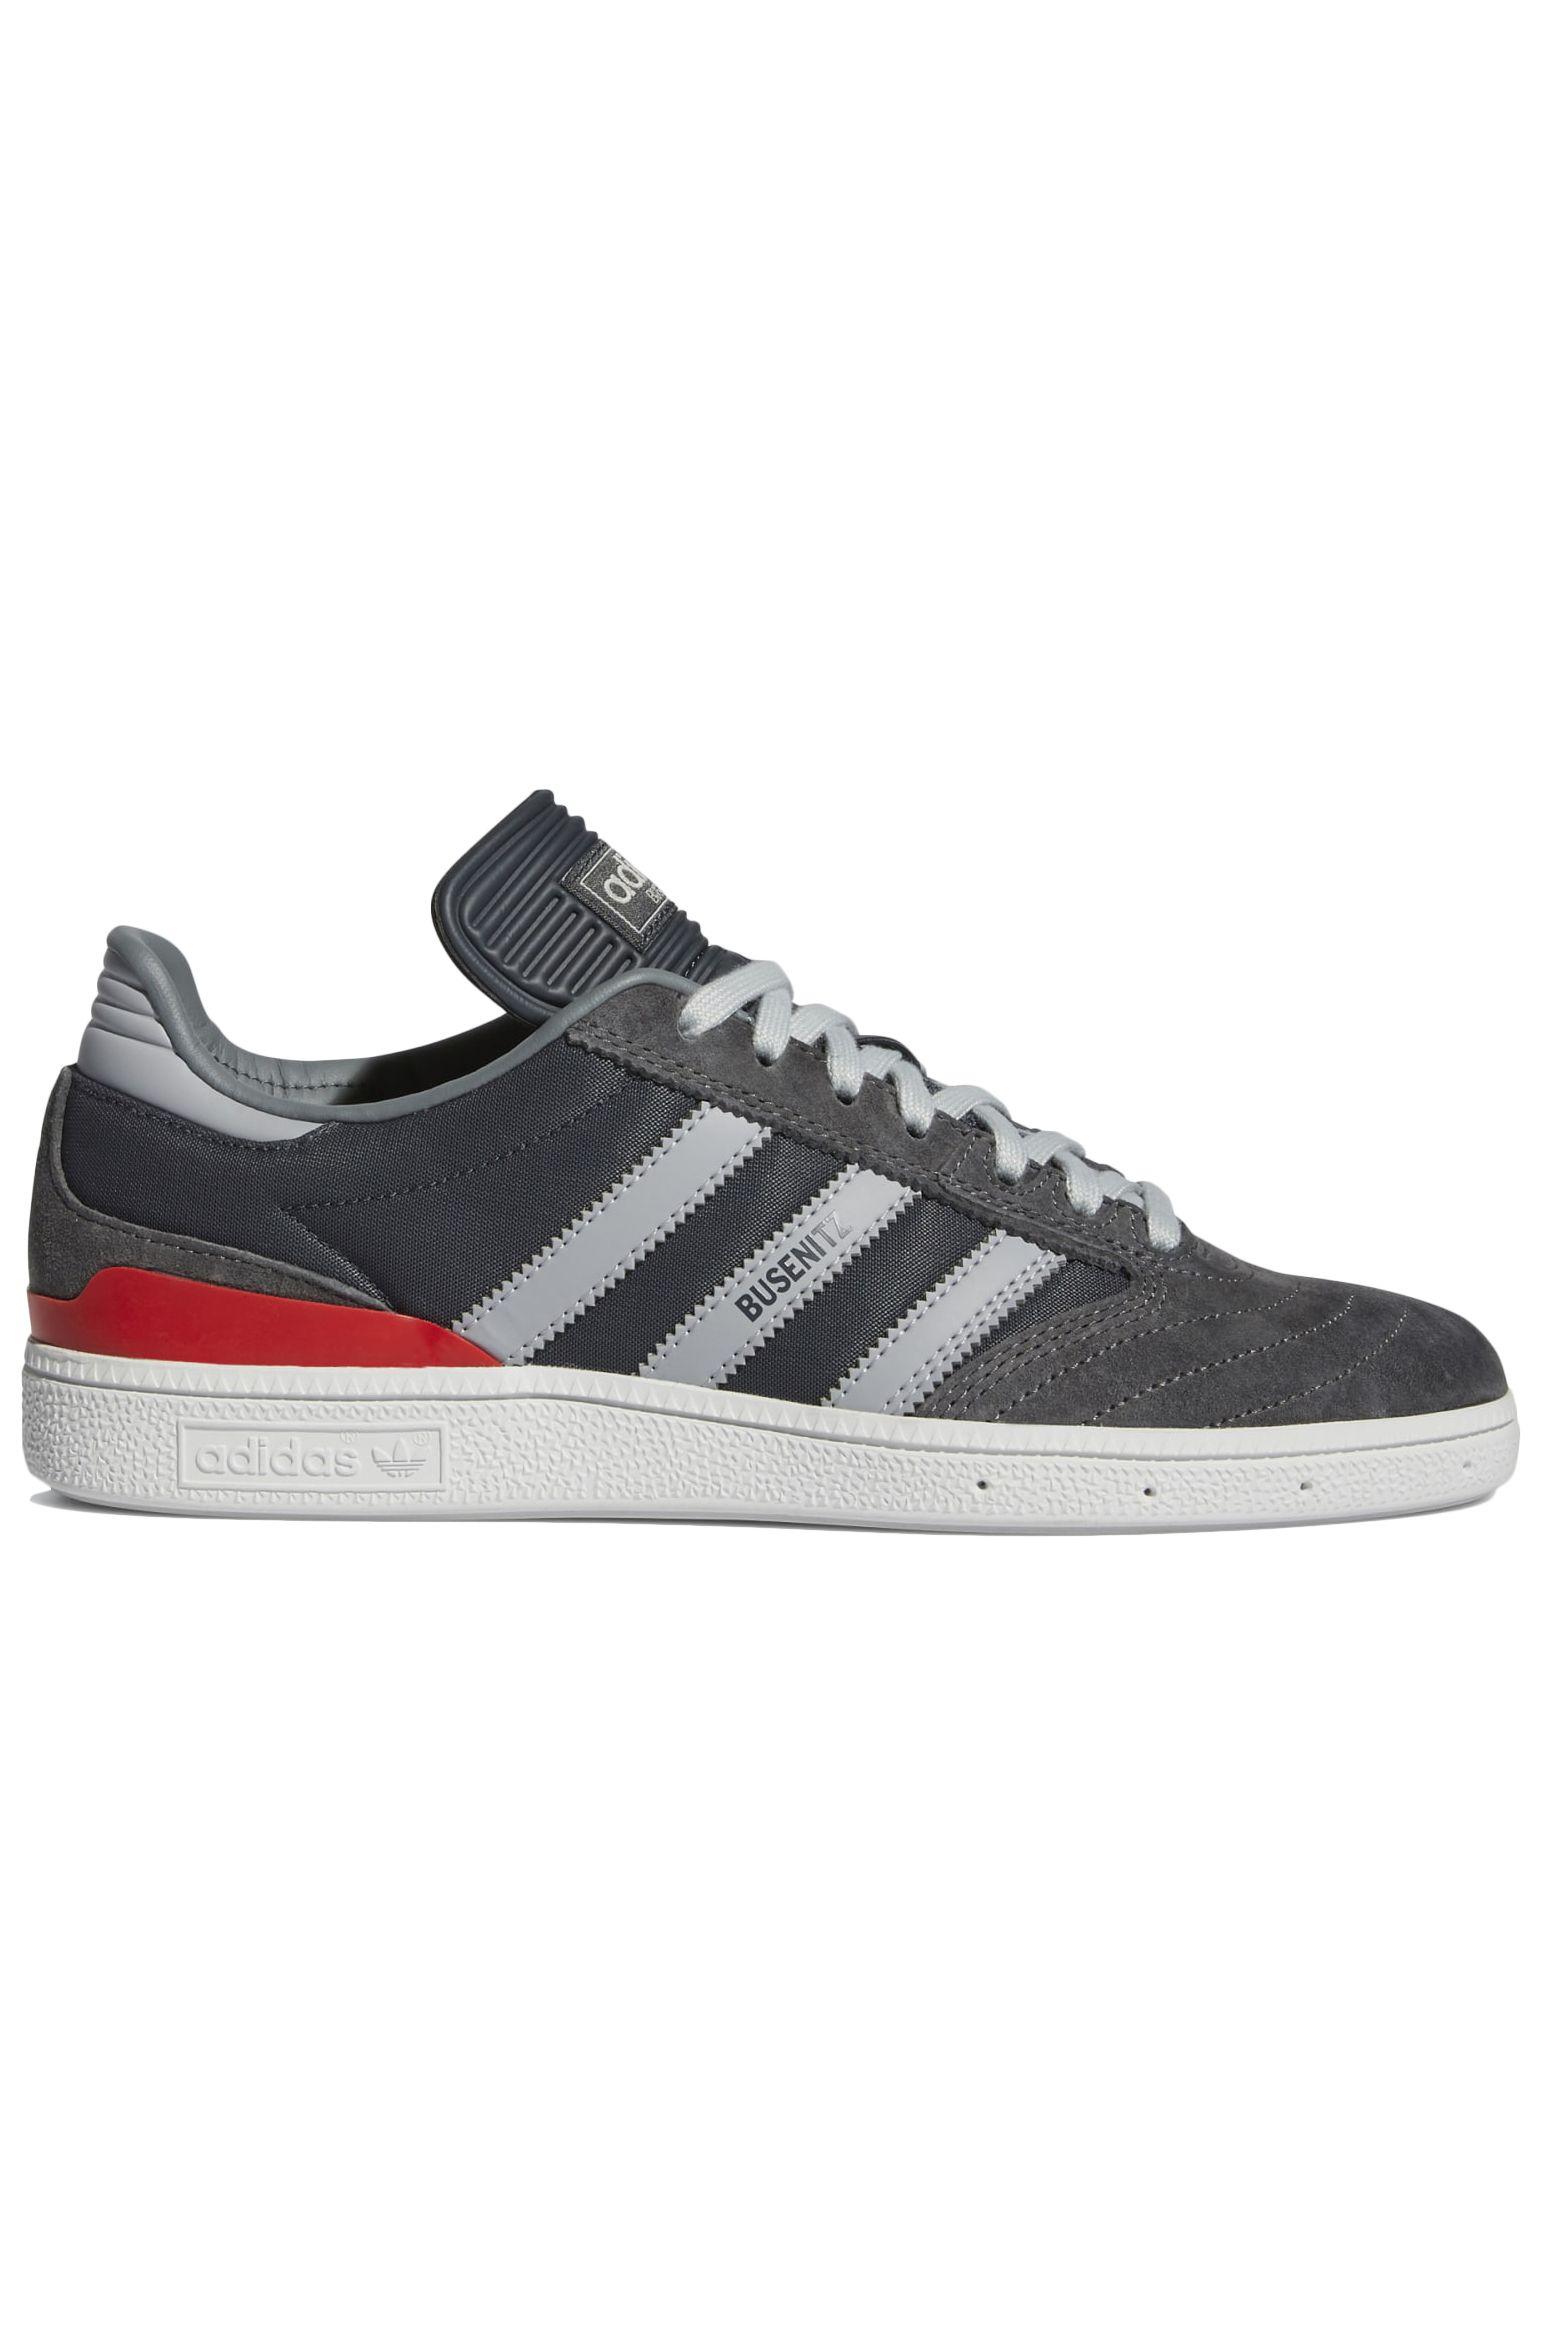 Adidas Shoes BUSENITZ Granit/Clonix/Dkgrey